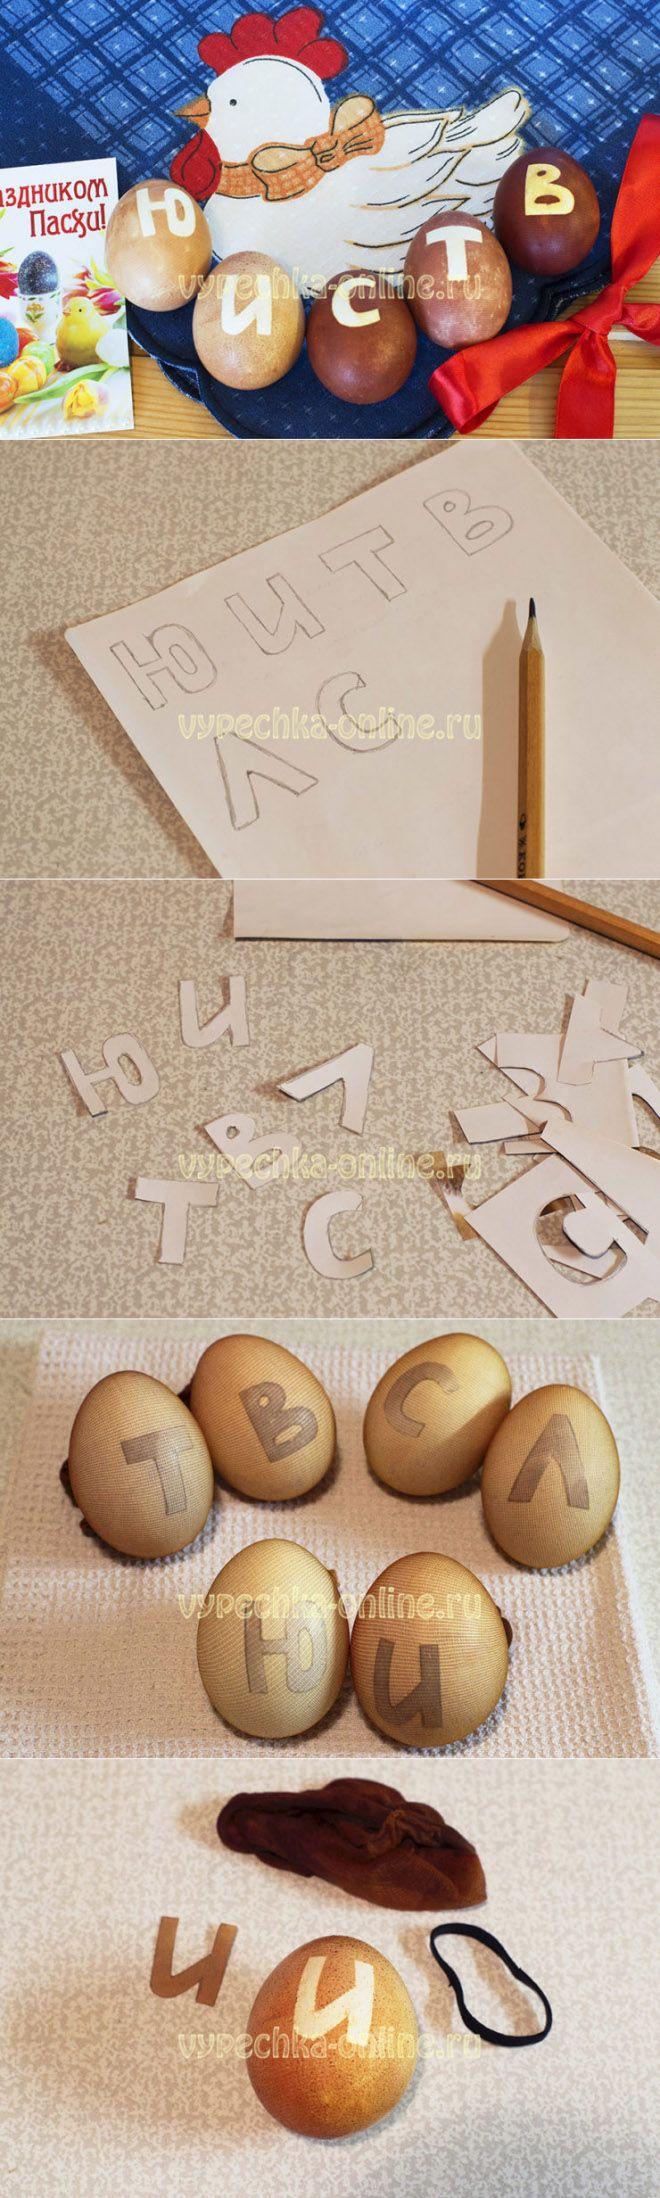 Именные пасхальные яйца (с буквами)!  http://vypechka-online.ru/pashalnye-retsepty/imennye-pashalnye-yajtsa/  P.S.: задавайте вопросы и делитесь впечатлениями в комментариях на сайте!   #Пасха #Пасхальные #Яйца #ПасхальныеЯйца #Крашенки #Крашеные #КрашеныйЯйца #Буквы #Имя #Рецепты #Вкусняшка #ВыпечкаОнлайн #Easter #Eggs #EasterEggs #Letters #Name #Stripes #Recipes #Yummy #CakesOnline